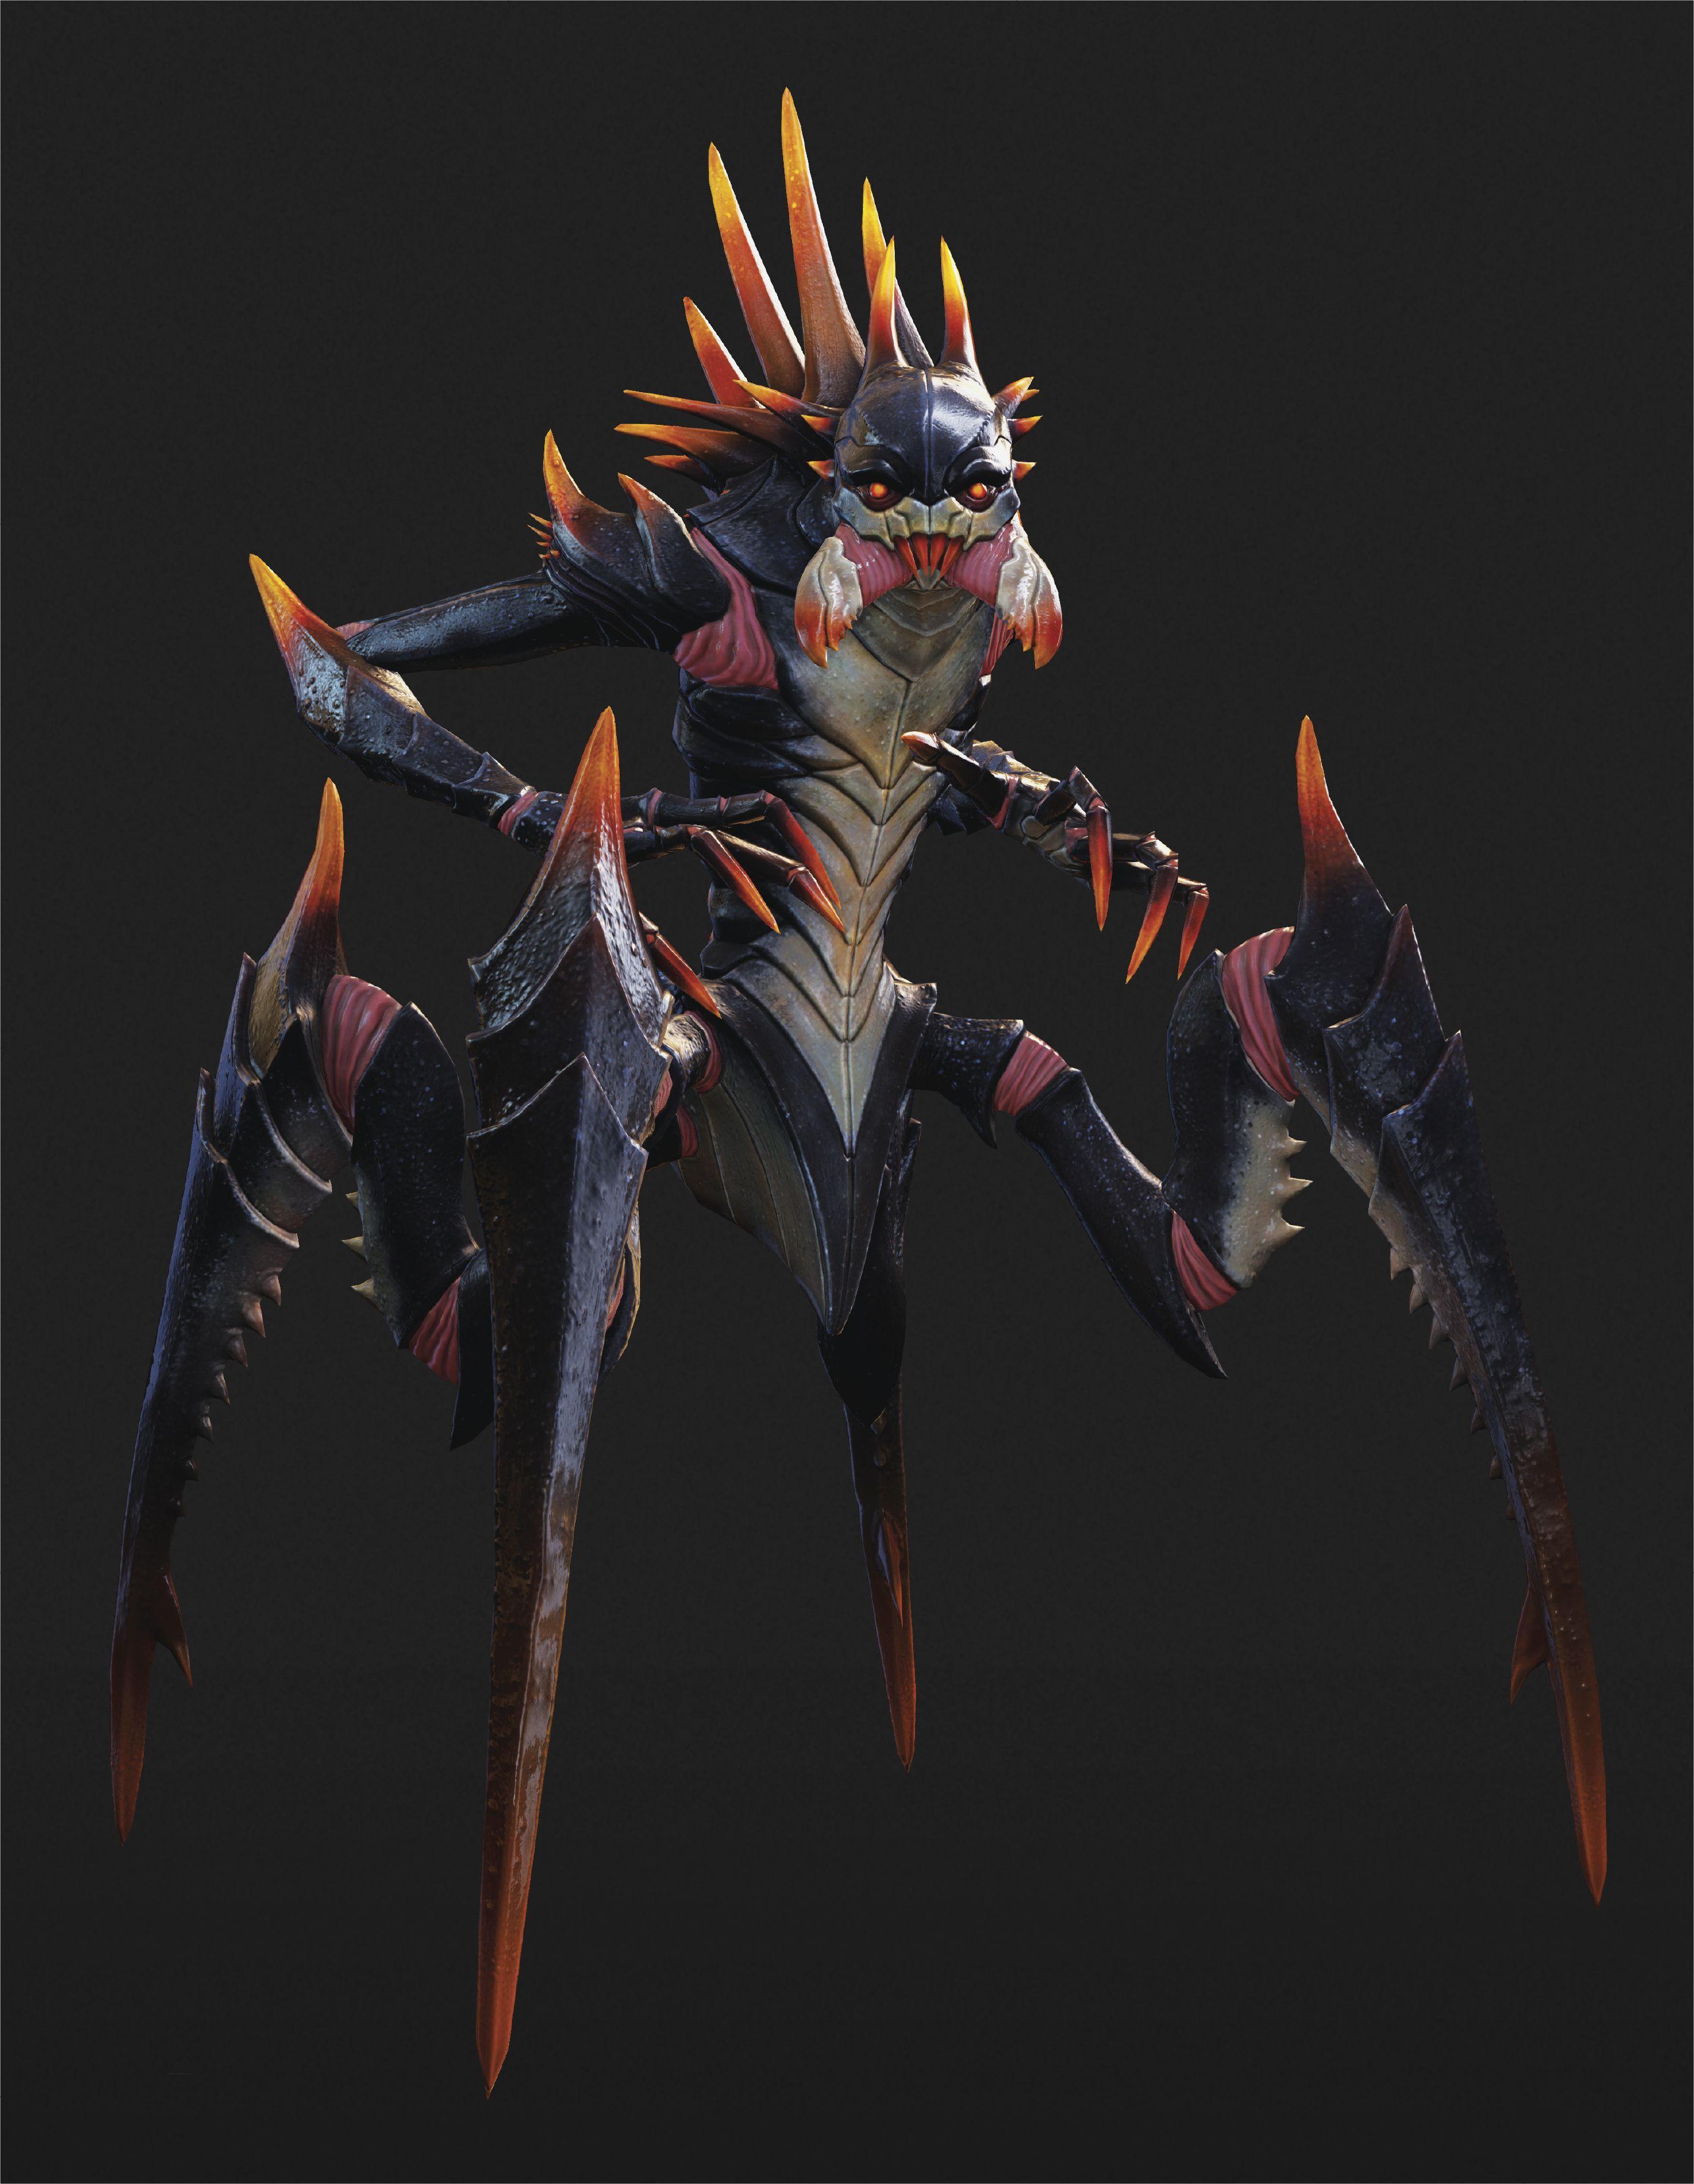 The Concept Art Of Xcom 2 Creature Concept Art Alien